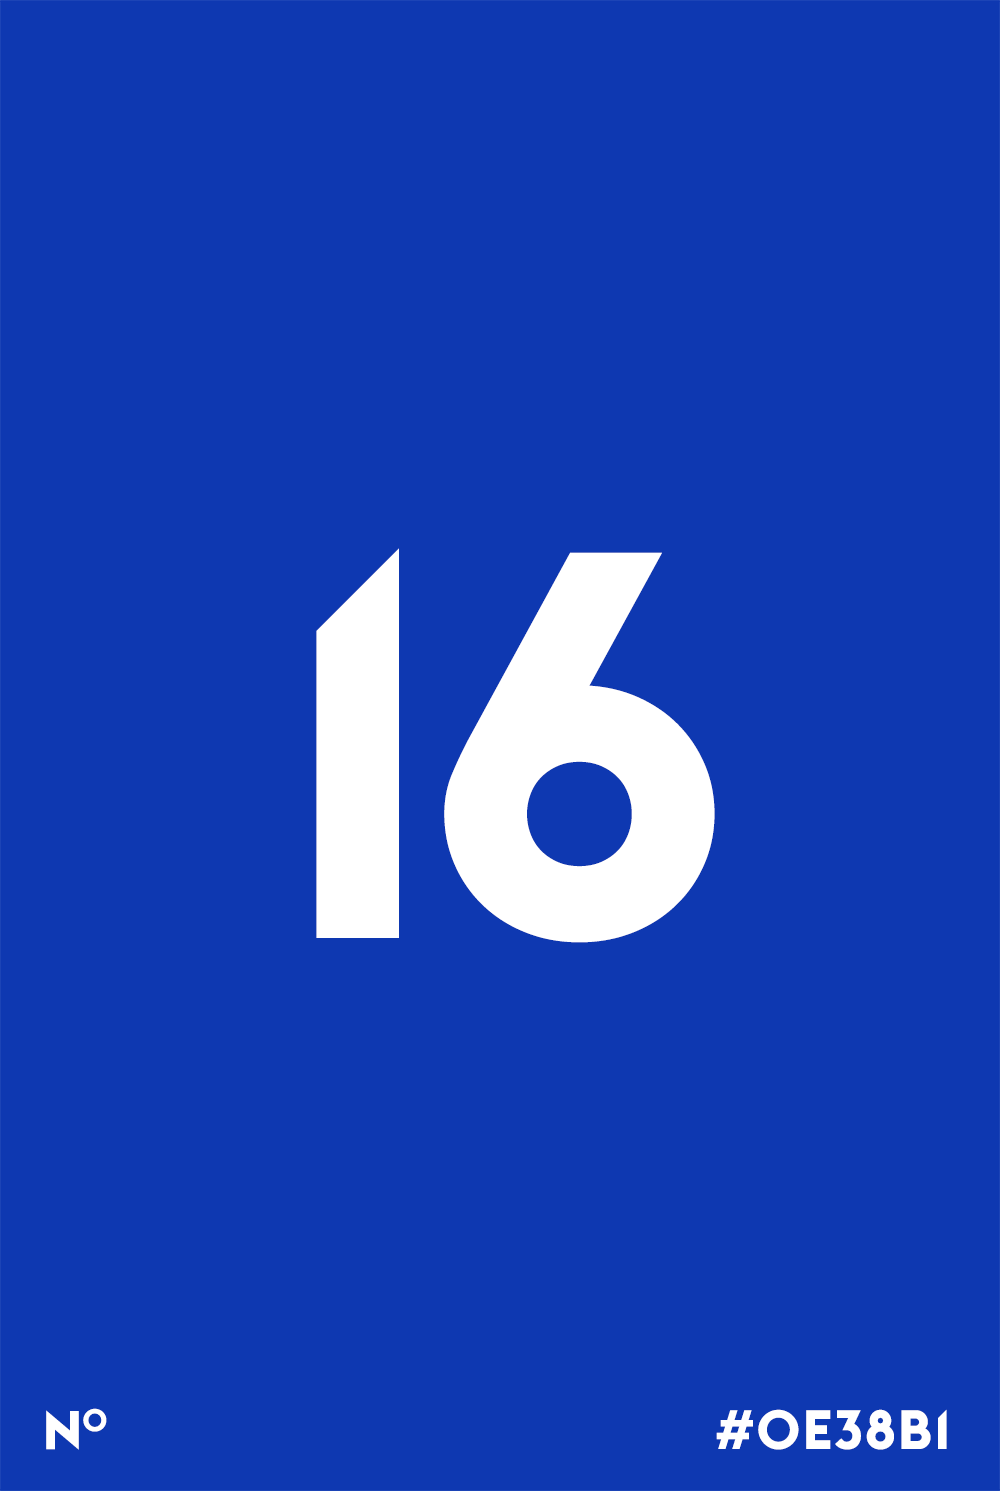 cc_0015_16